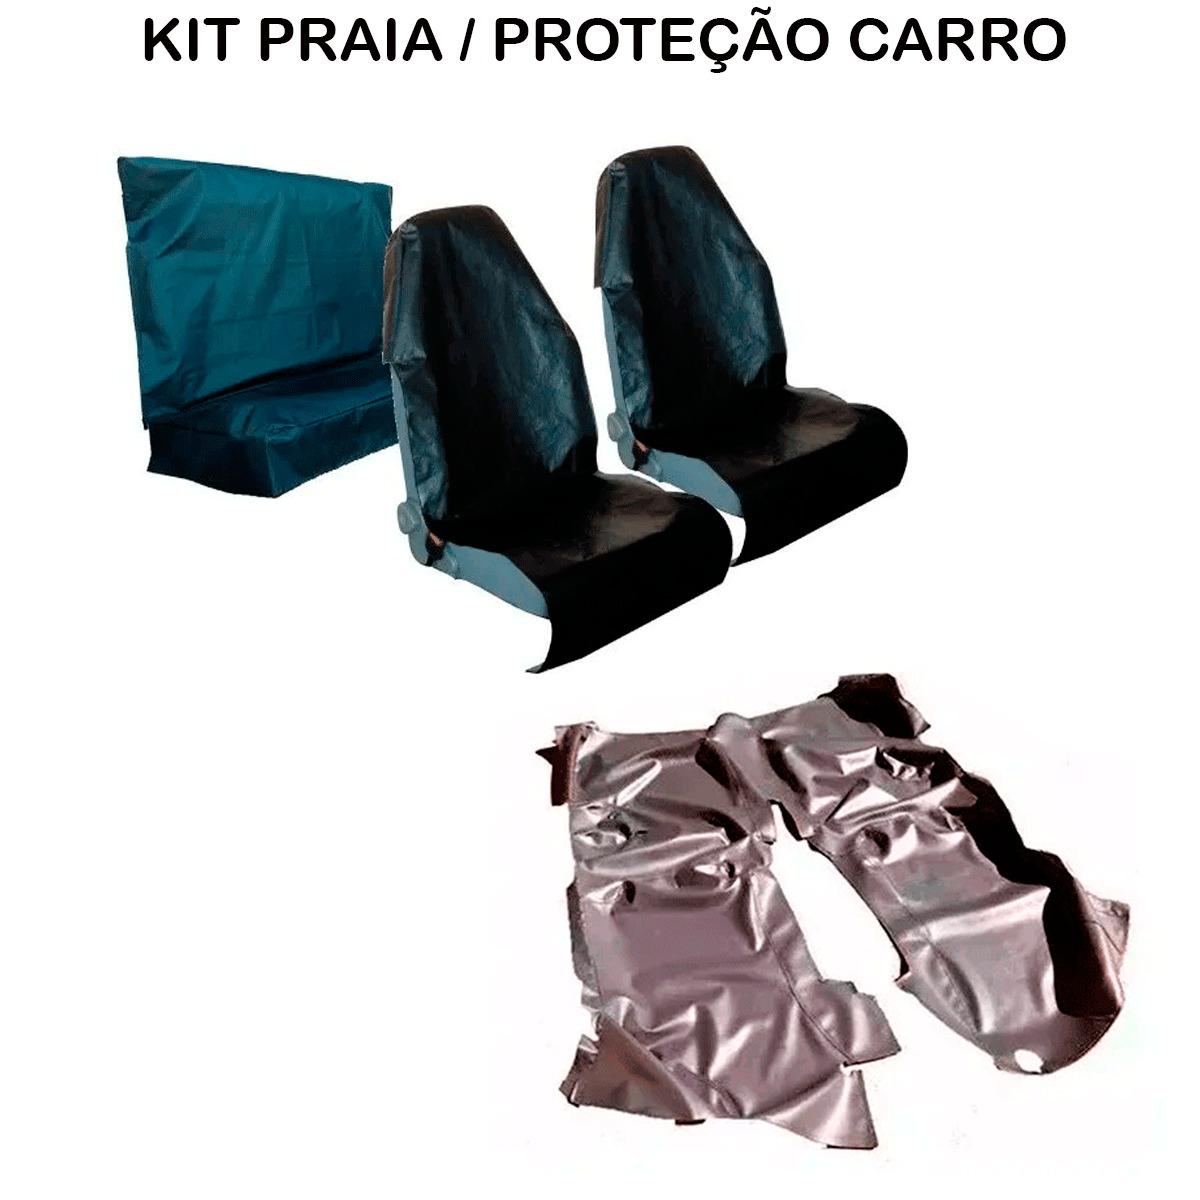 Tapete Em Vinil Chevrolet Cruze 2012 a 2020 + Capa Banco Protecao Banco Areia Suor Academia